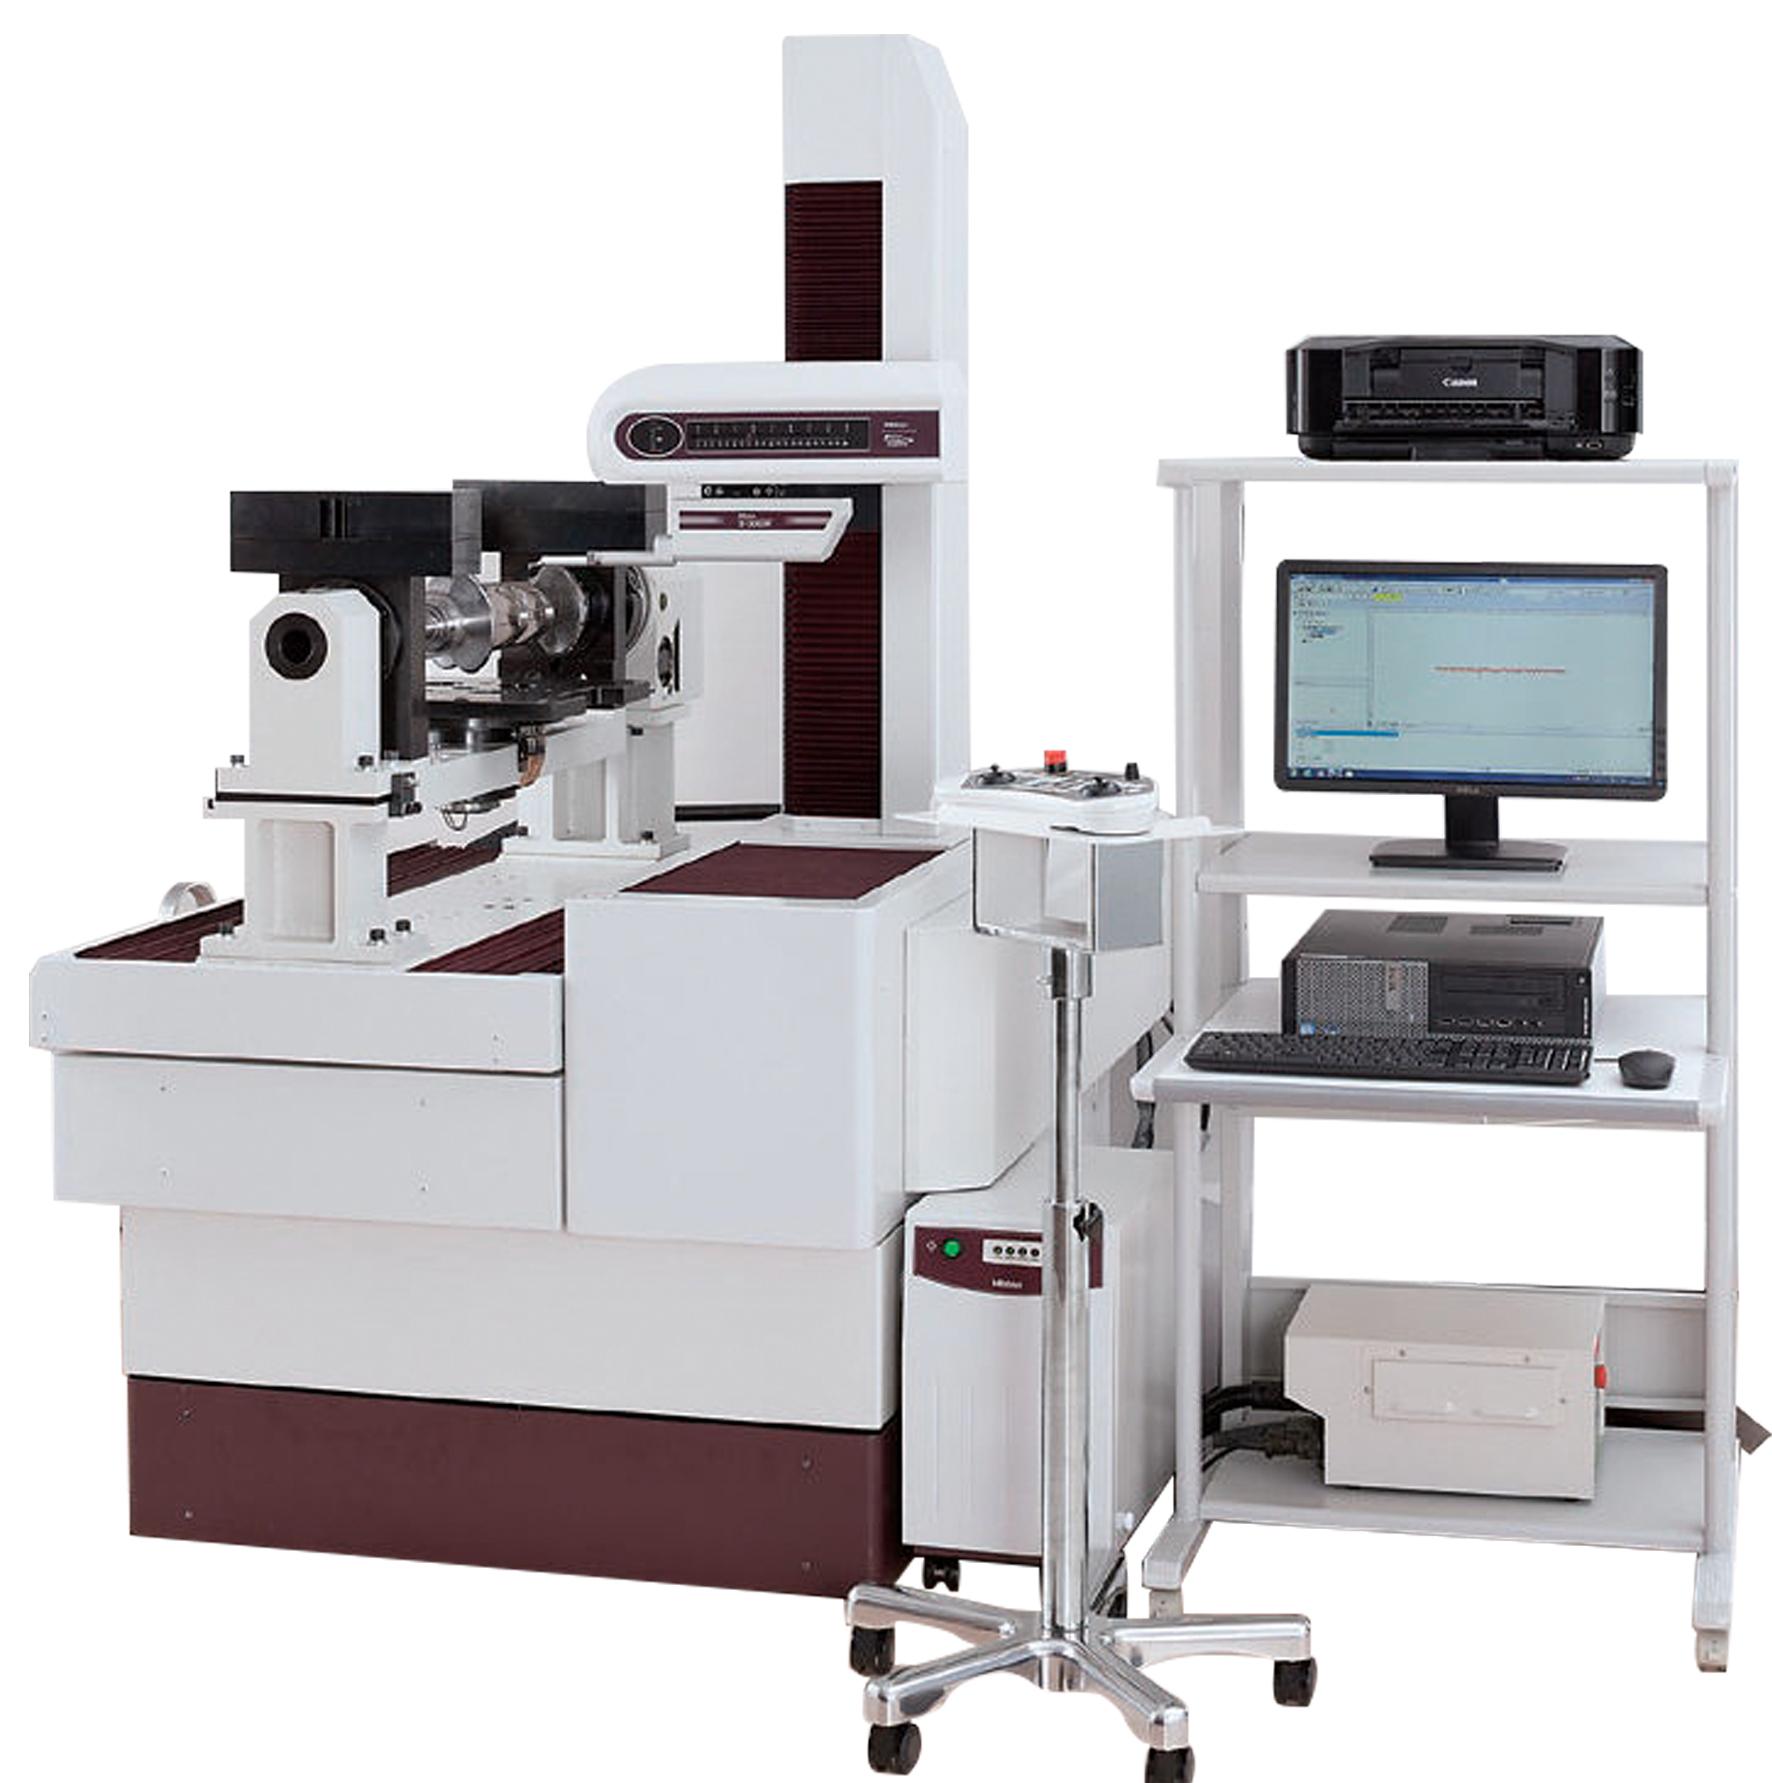 Maquina de rugosidad de Banco Serie 178 (SV-3100S4, SV-3100H4, SV-3100W4, SV-310